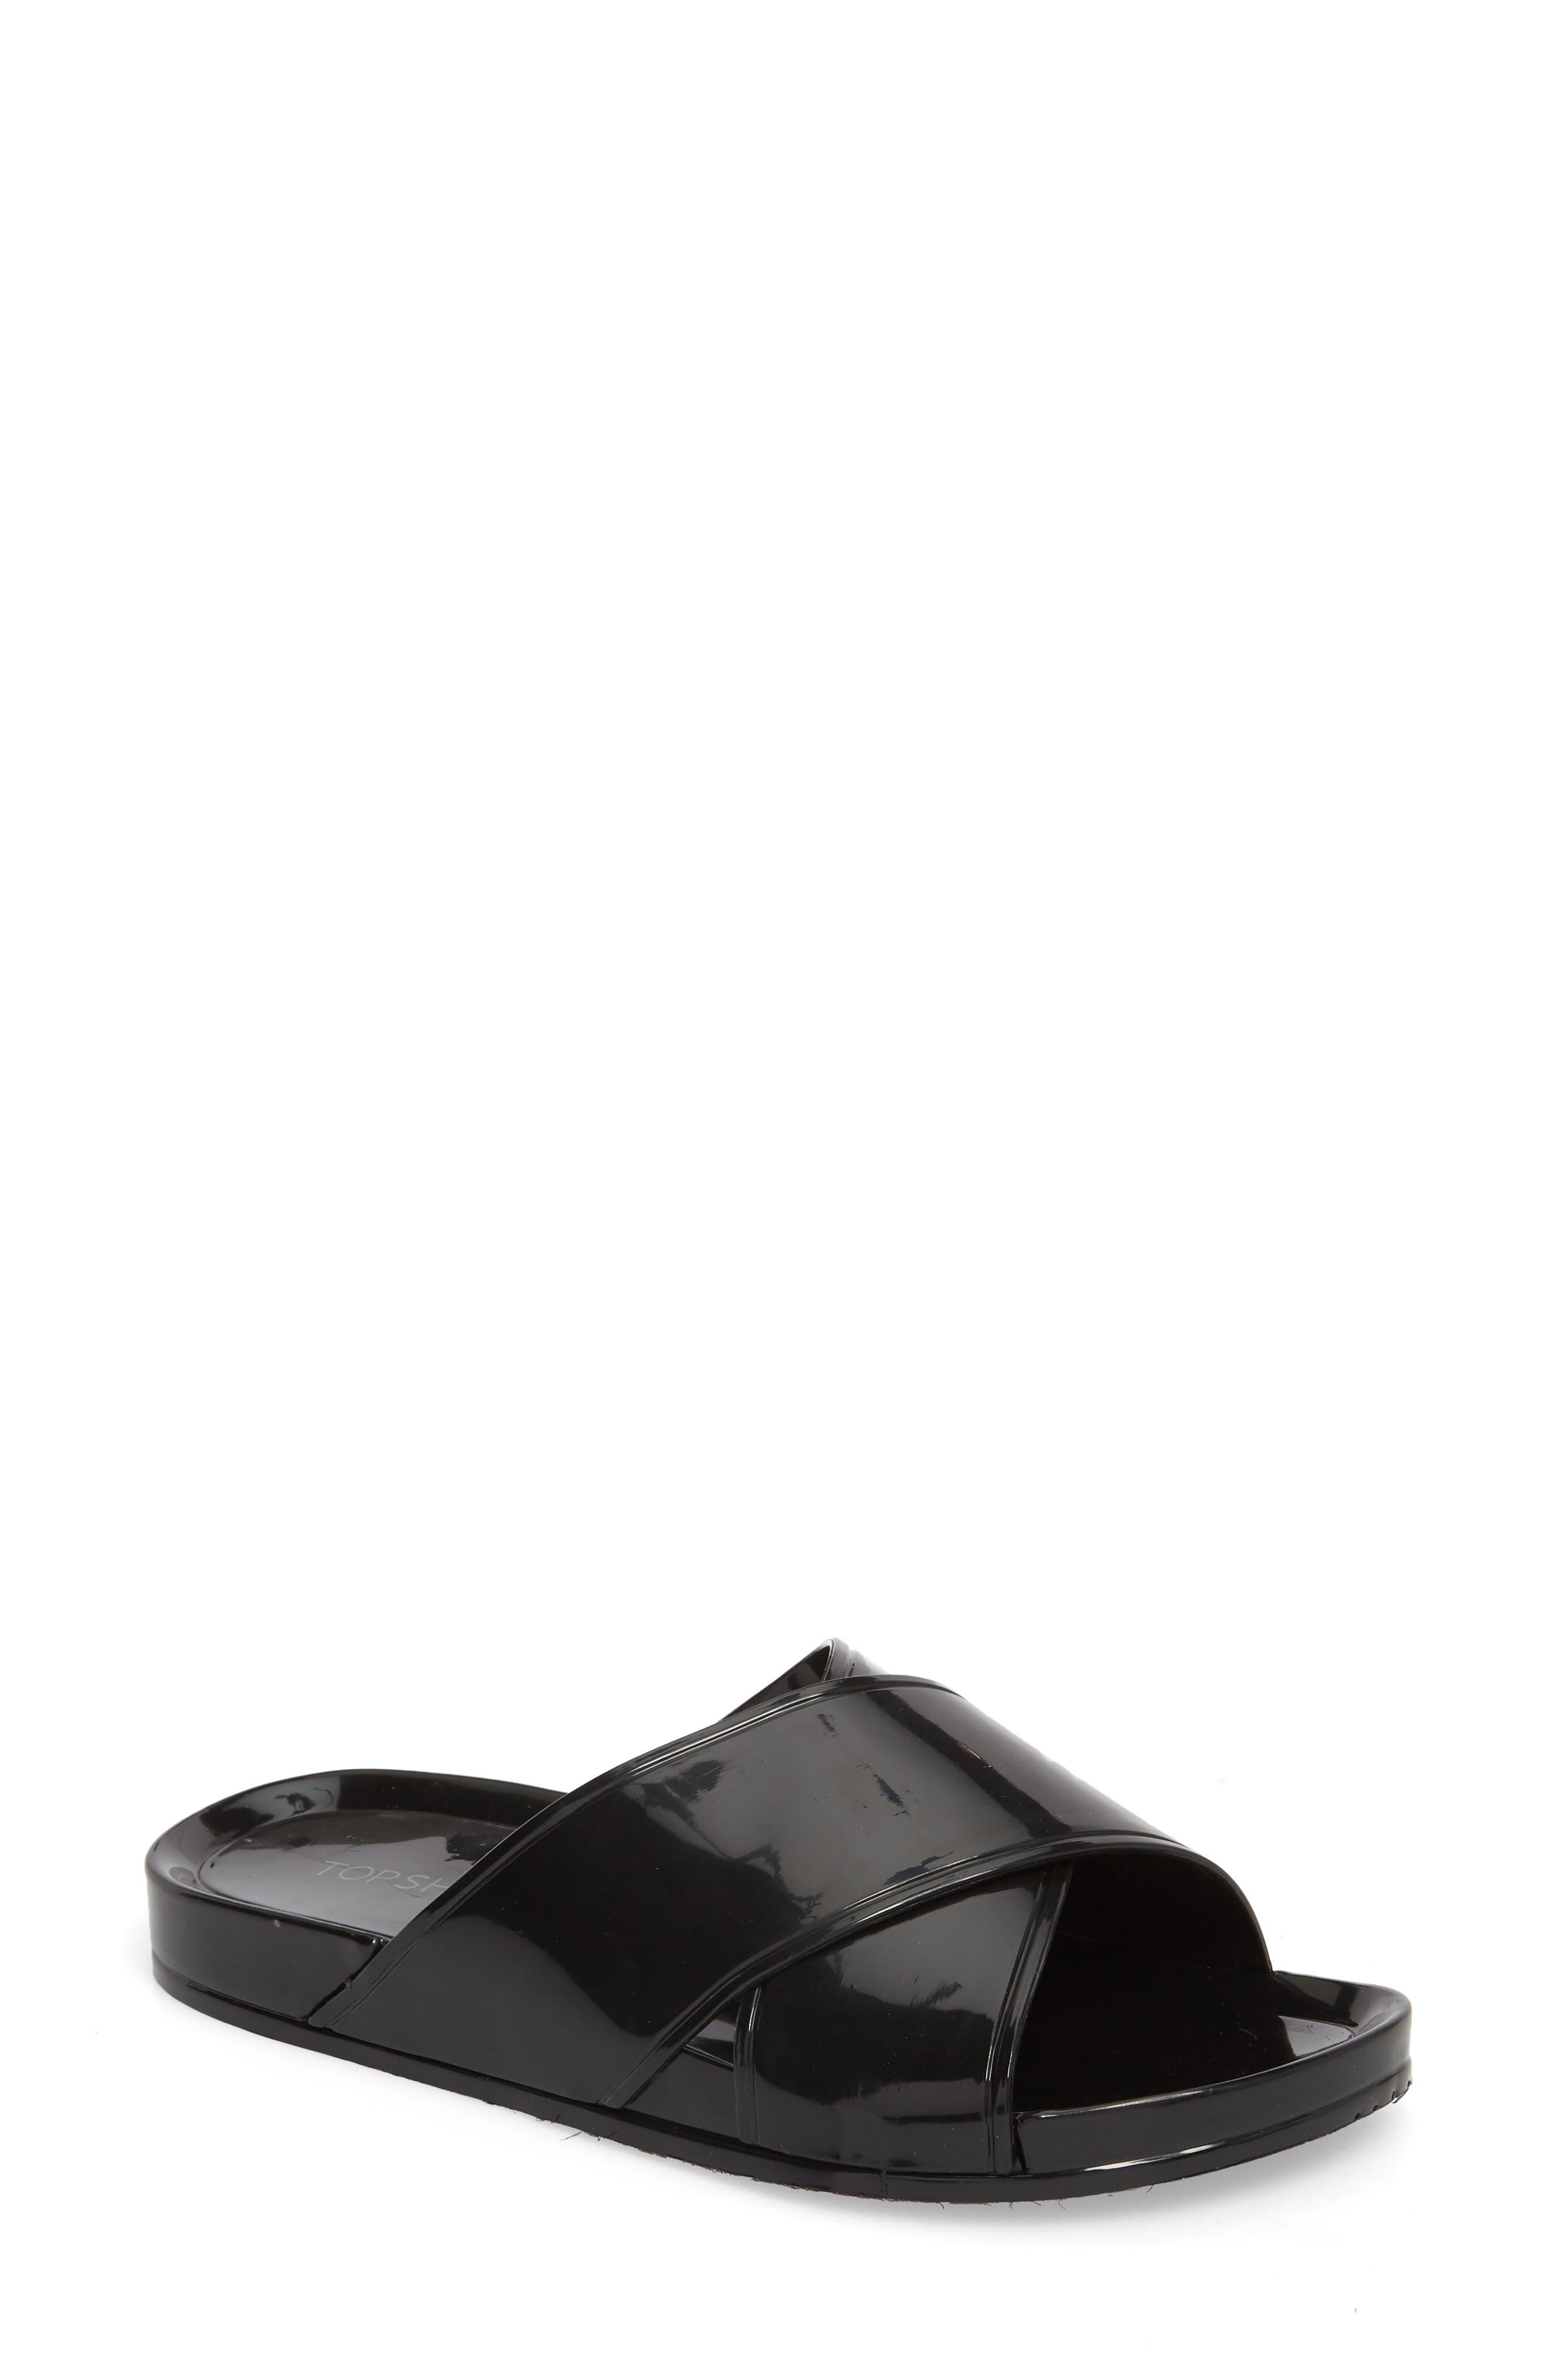 Roxy Jelly Slide Sandal,                             Main thumbnail 1, color,                             001